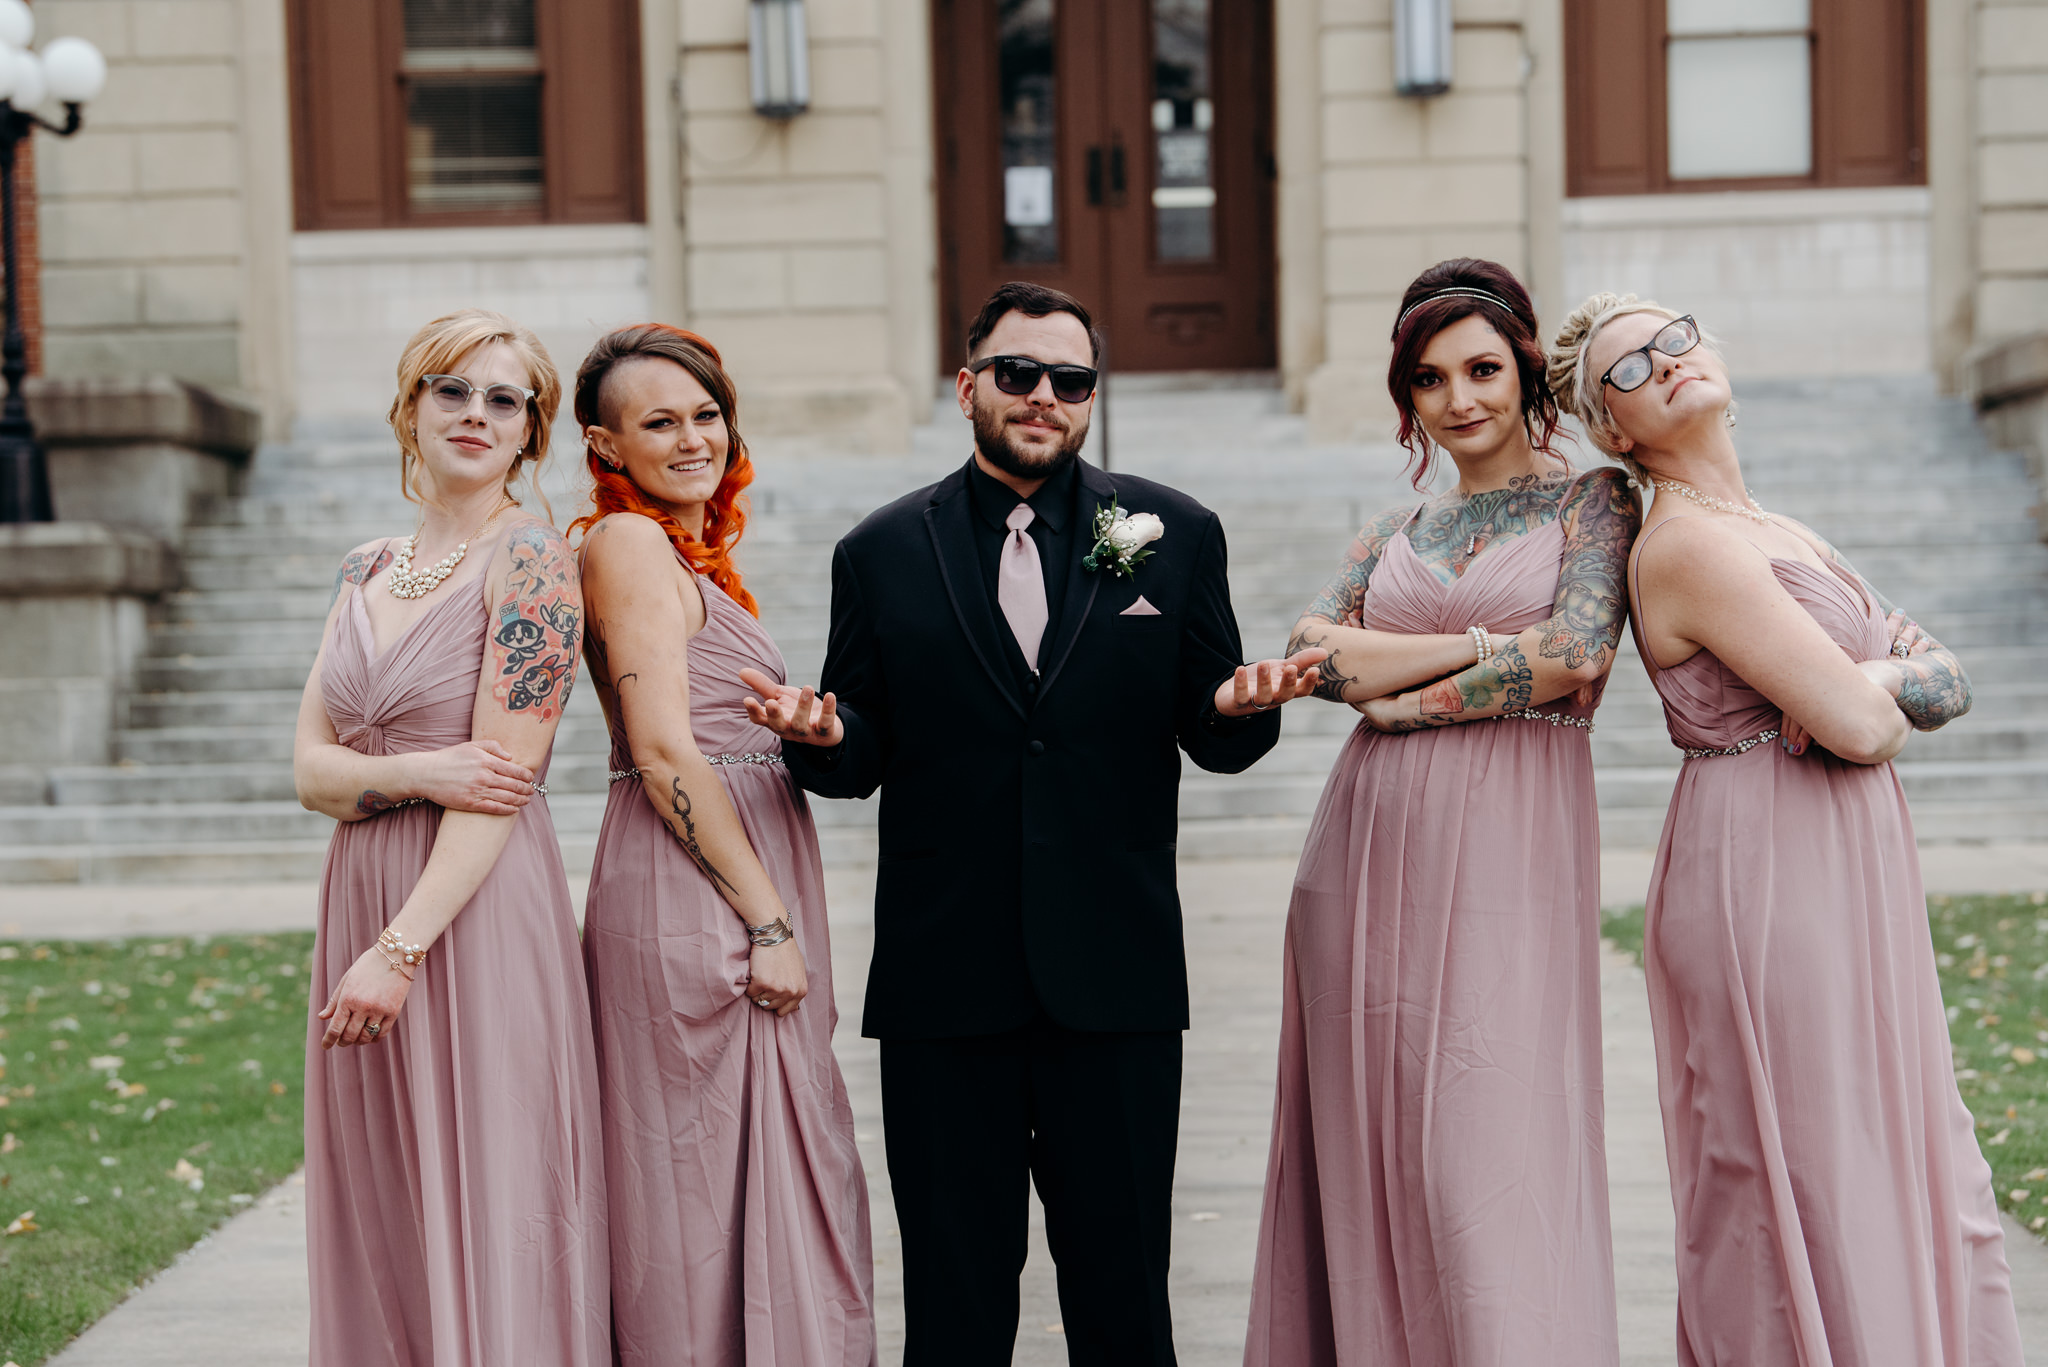 Grant Beachy Photo portrait wedding goshen elkhart south bend chicago-031.jpg